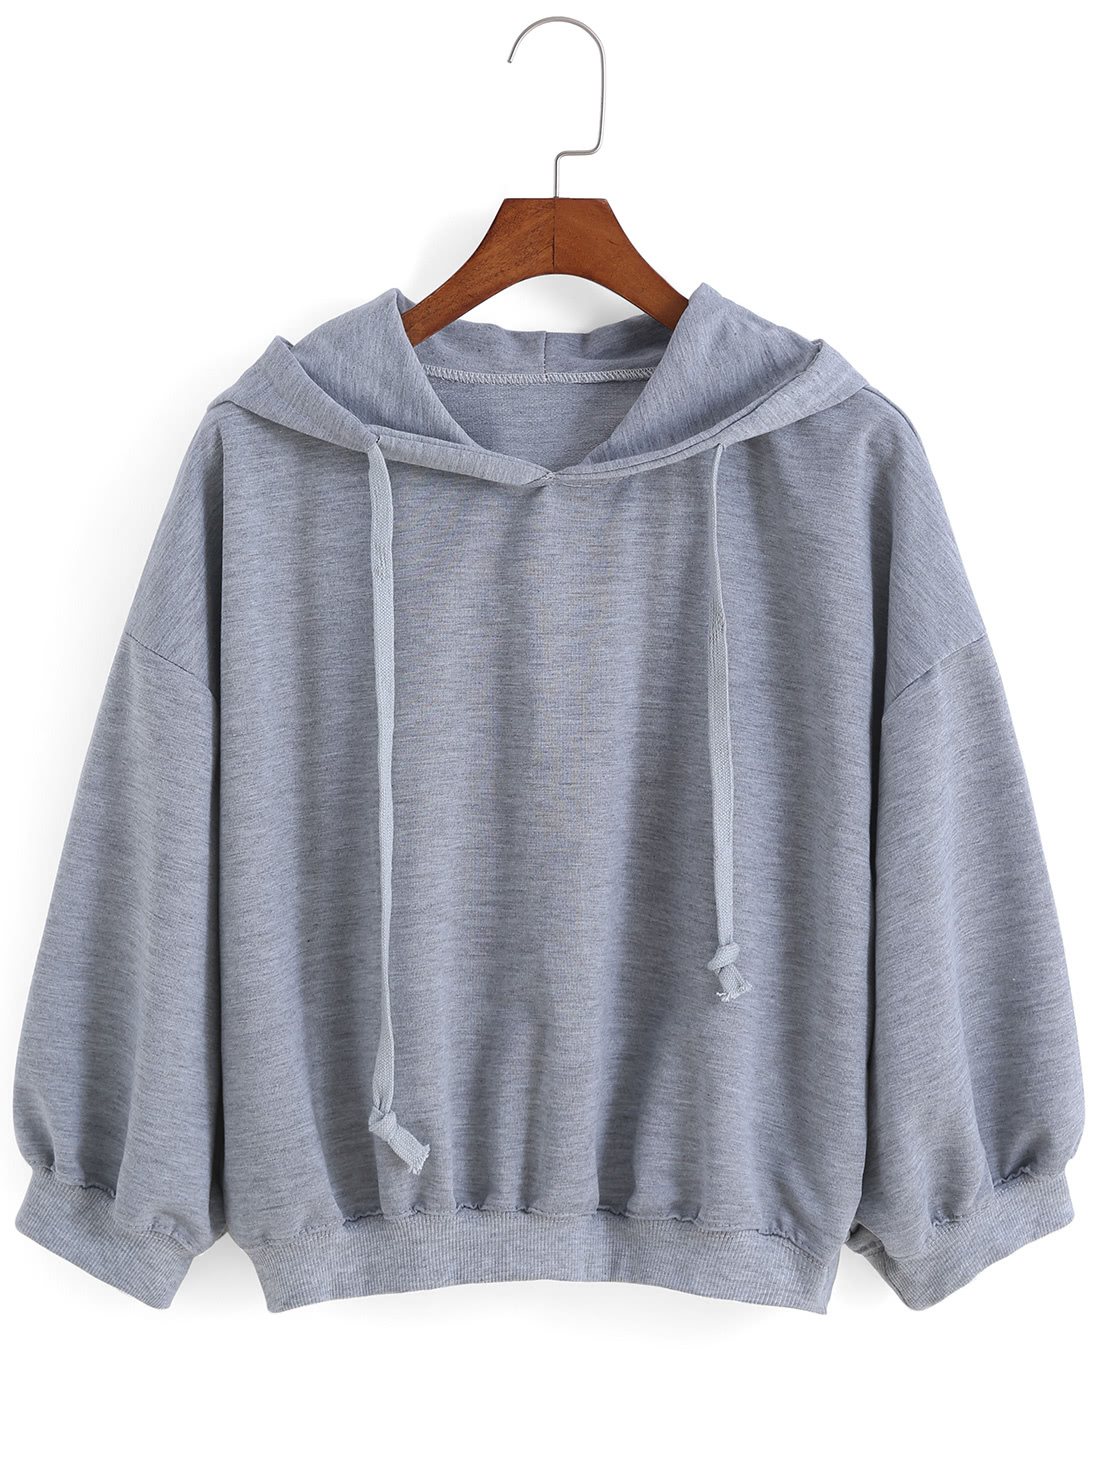 Hooded Drawstring Loose Sweatshirt RSWS150822056